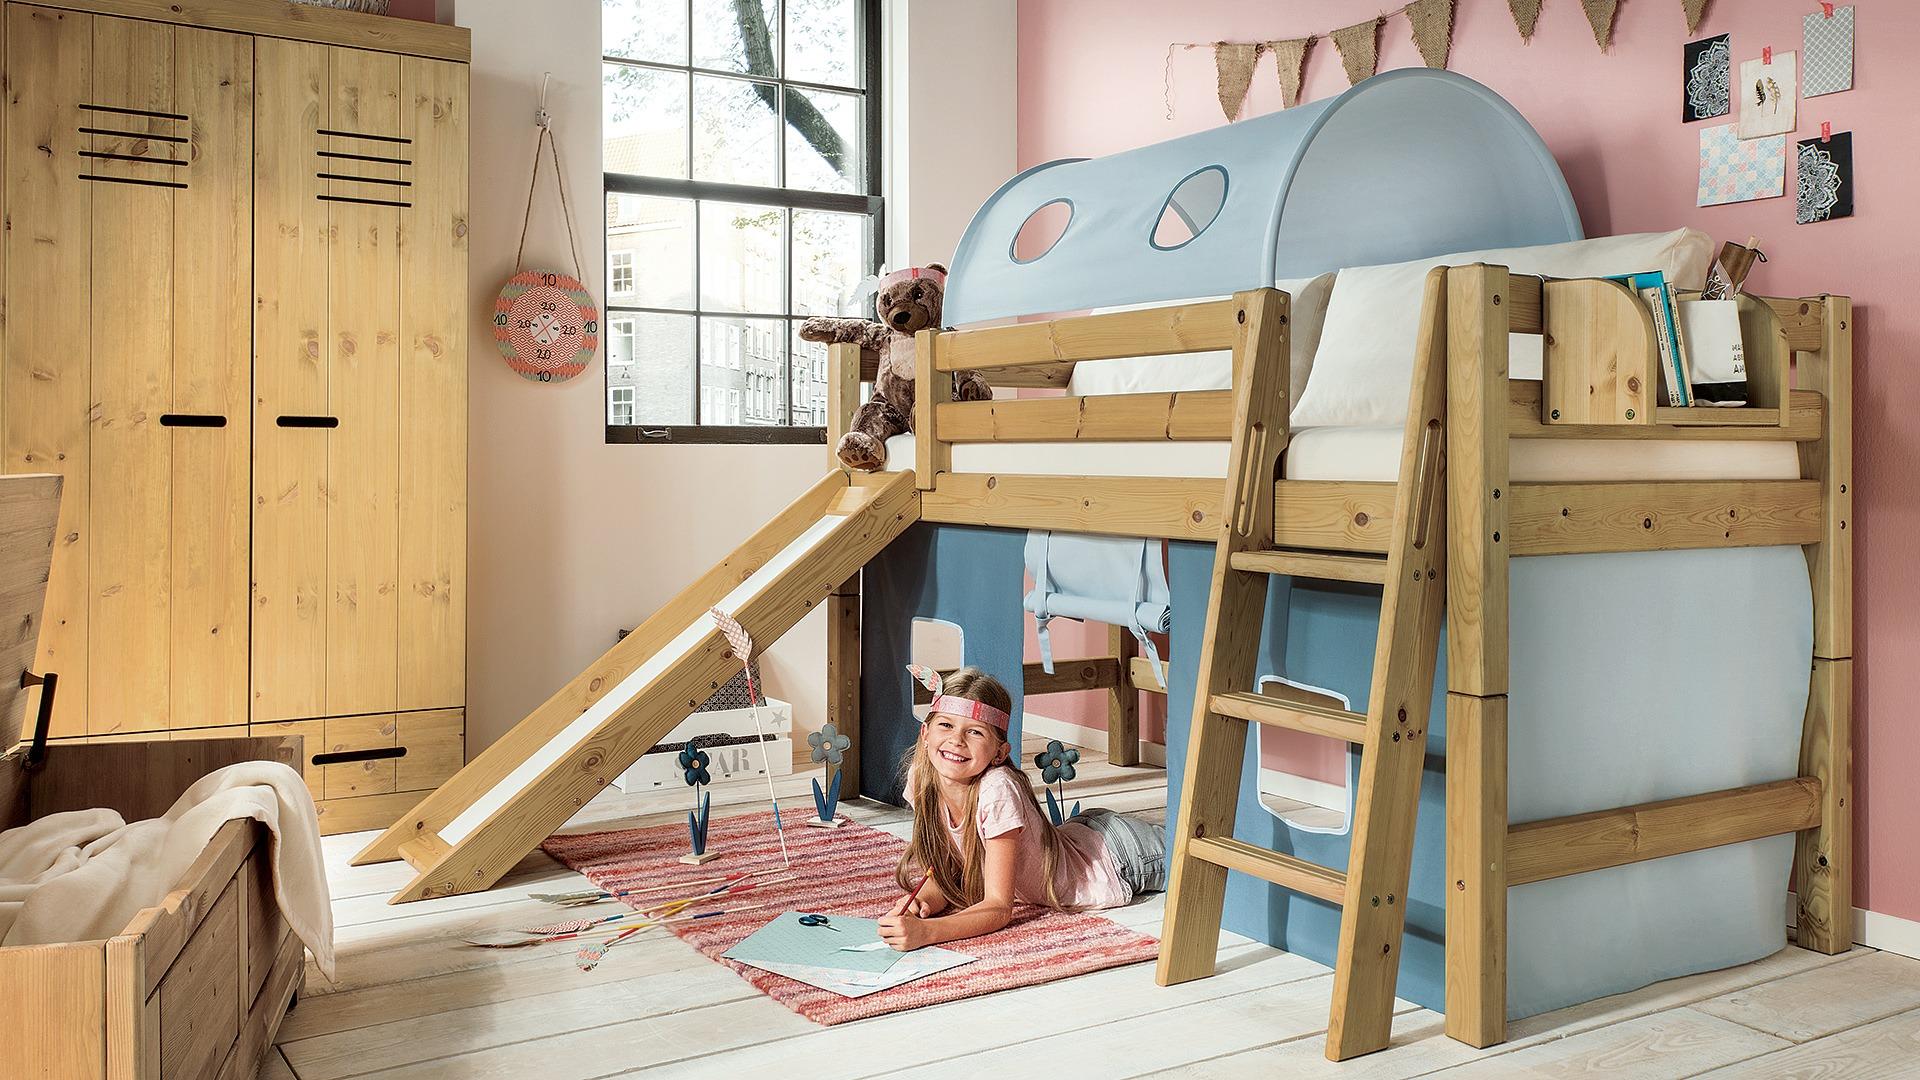 Full Size of Hochbetten Kinderzimmer Mini Hochbett In 4 Tollen Varianten Sofa Regale Regal Weiß Kinderzimmer Hochbetten Kinderzimmer